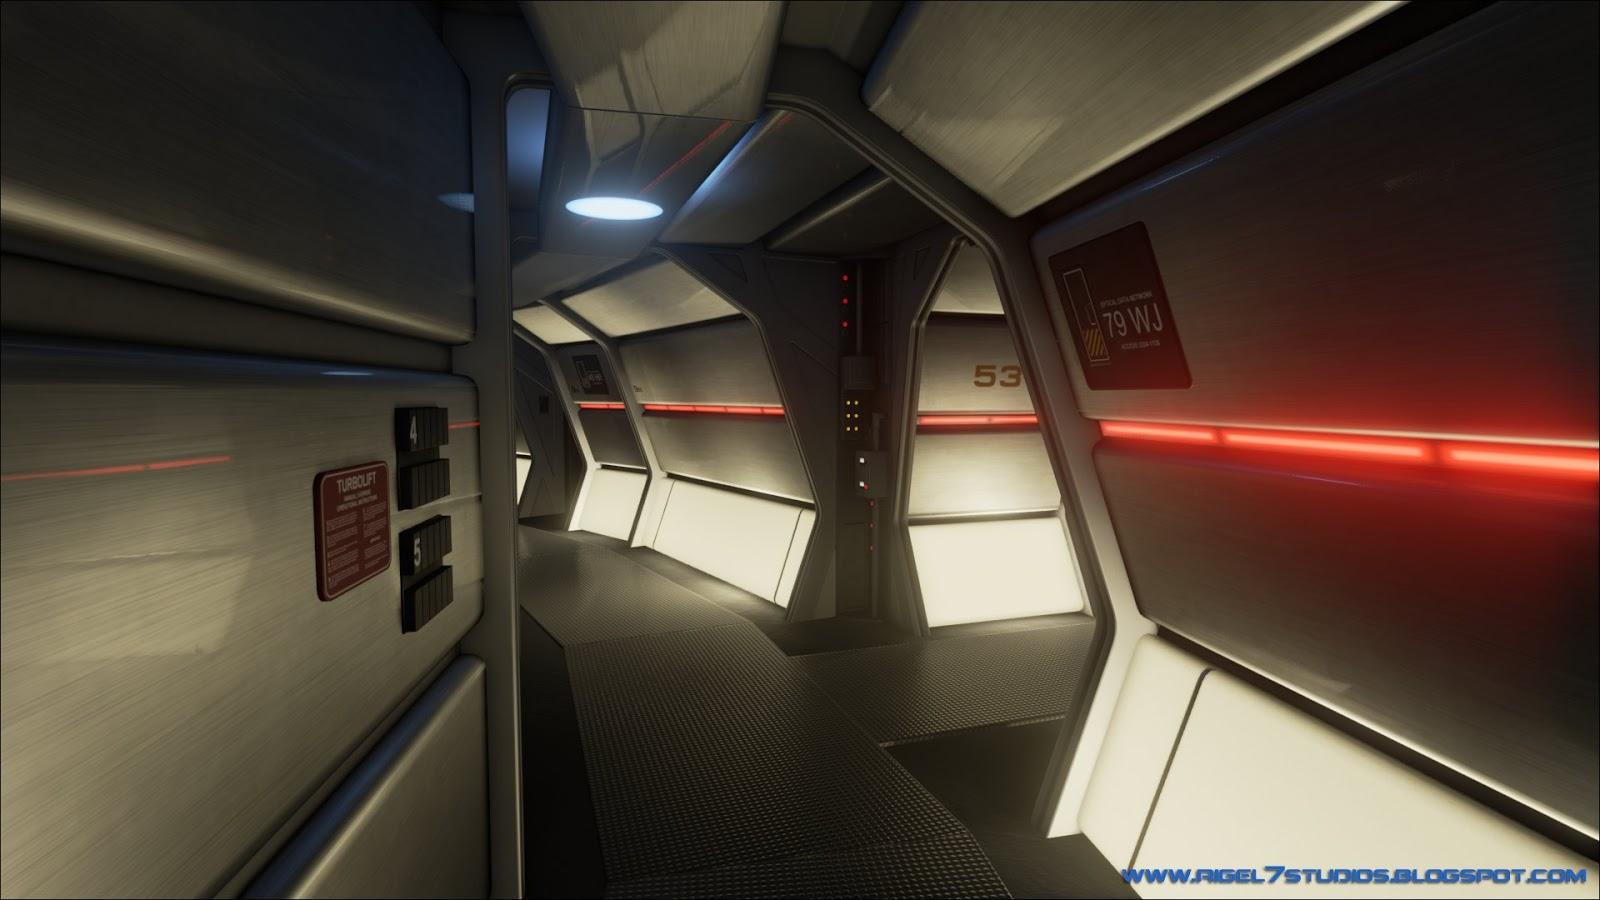 Rigel VII Refit Enterprise Corridors Redux